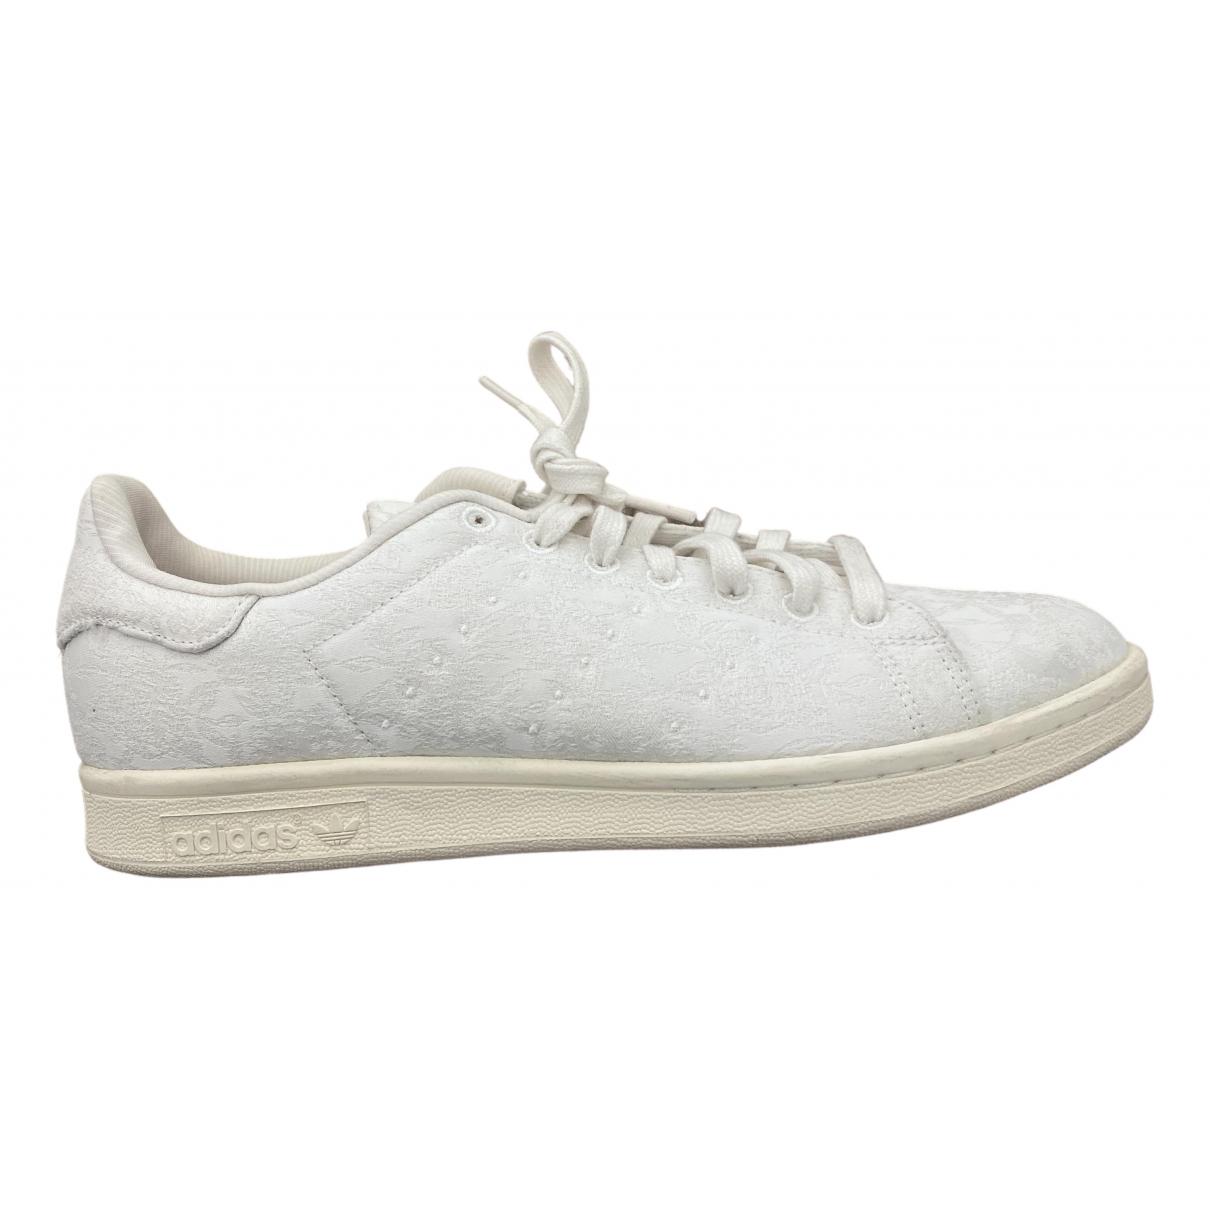 Adidas - Baskets Stan Smith pour femme - blanc